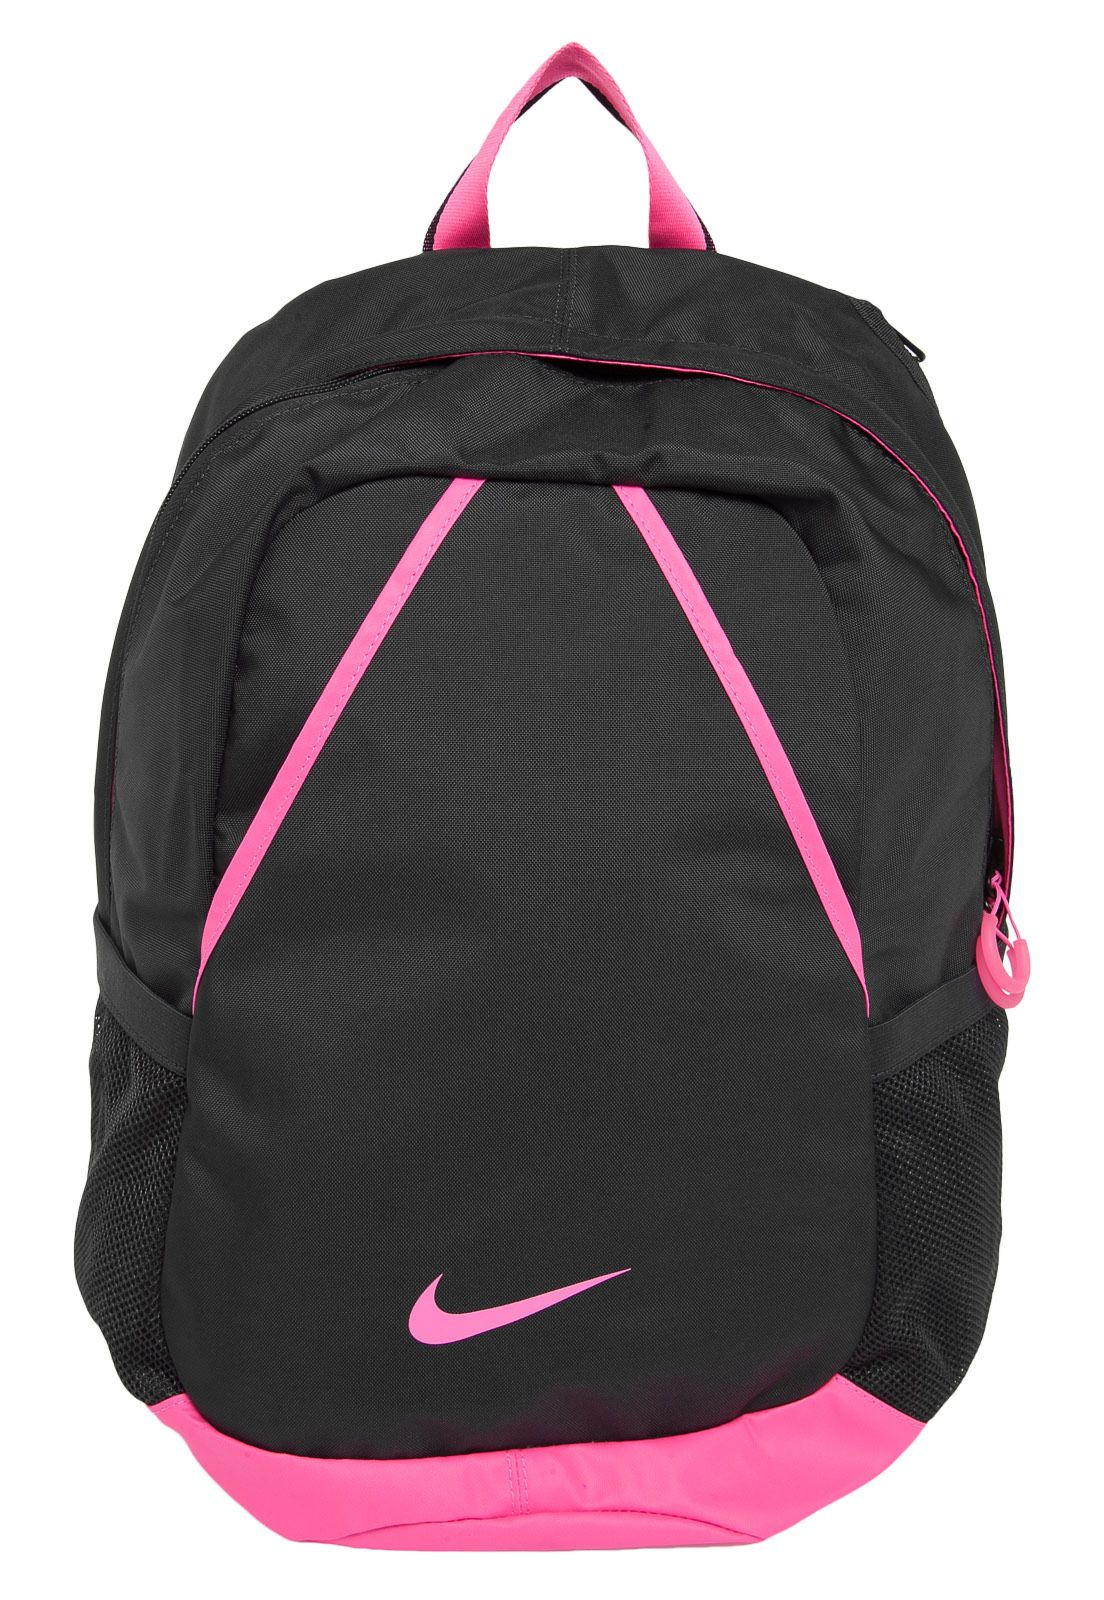 5cbc73f94 Mochila Nike Varsity Preta - Marca Nike